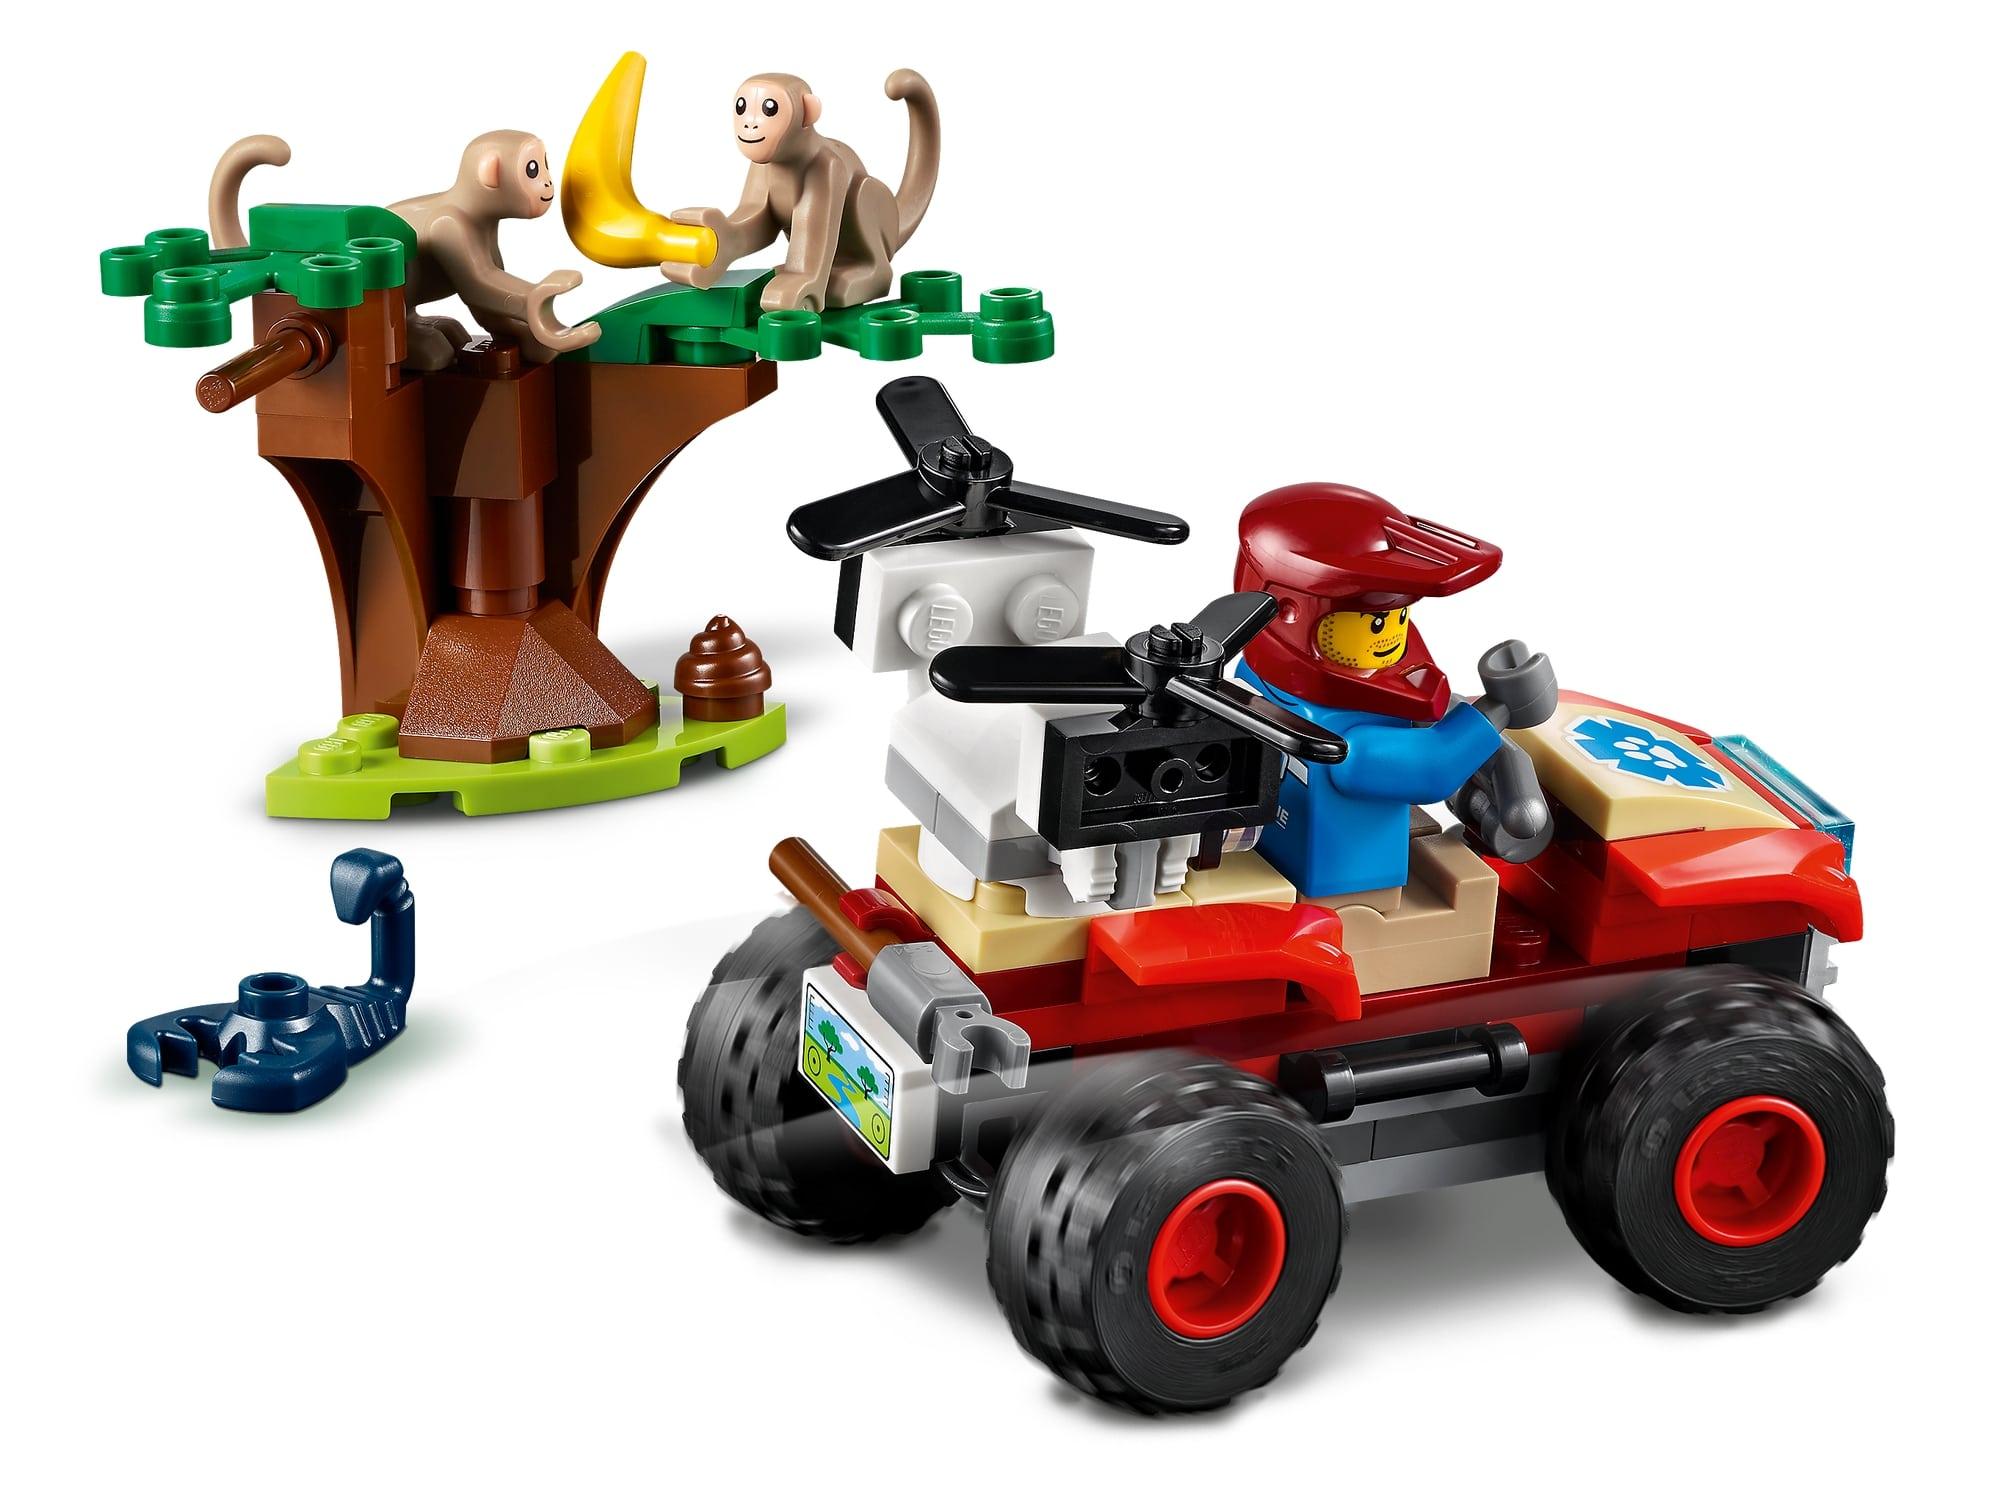 LEGO City 60300 Tierrettungs Quad 4